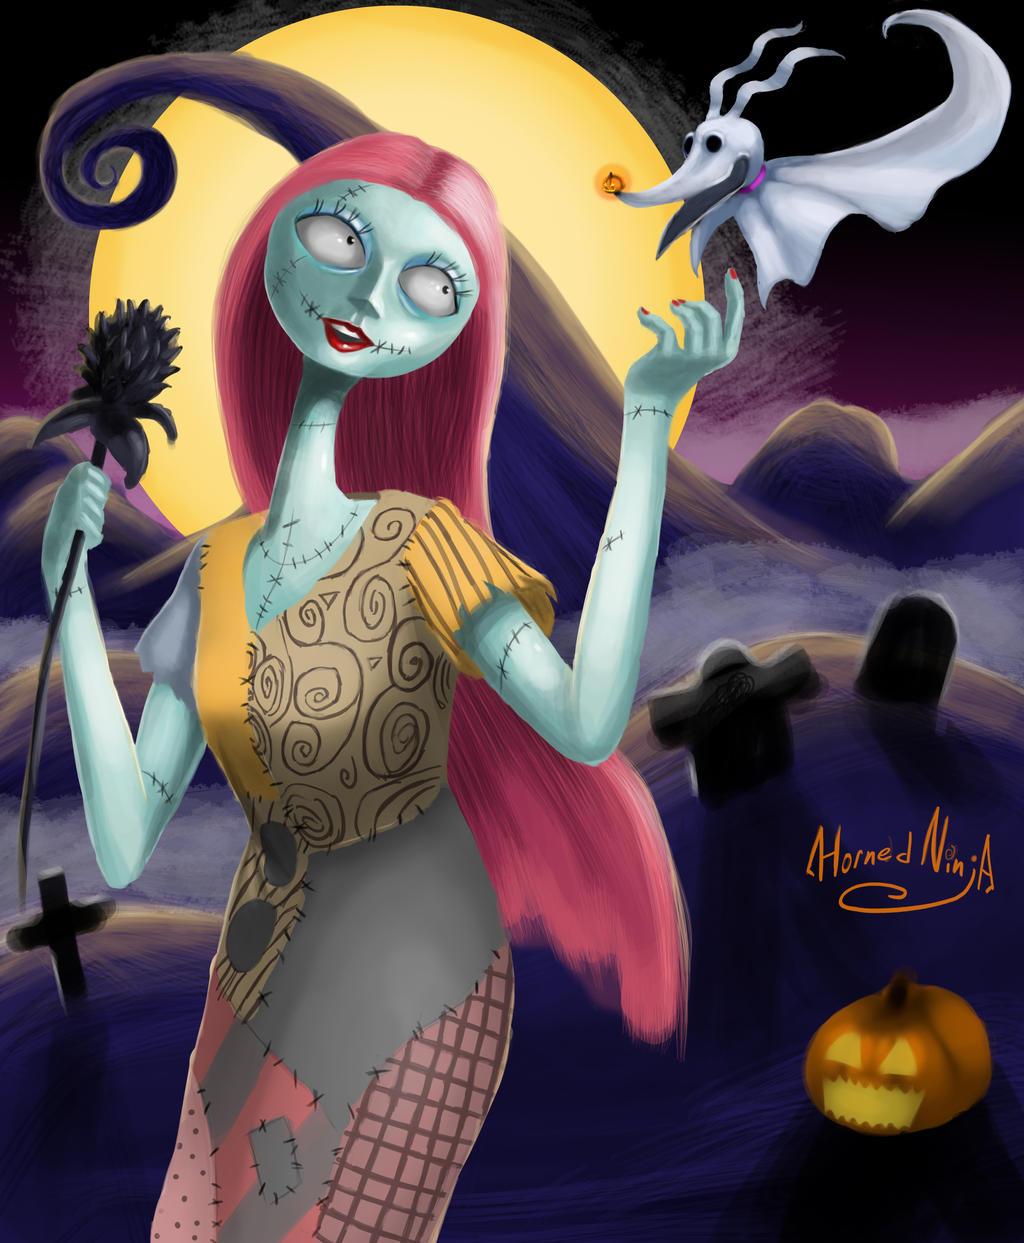 Sally, The Nightmare Before Christmas by HornedNinja on DeviantArt